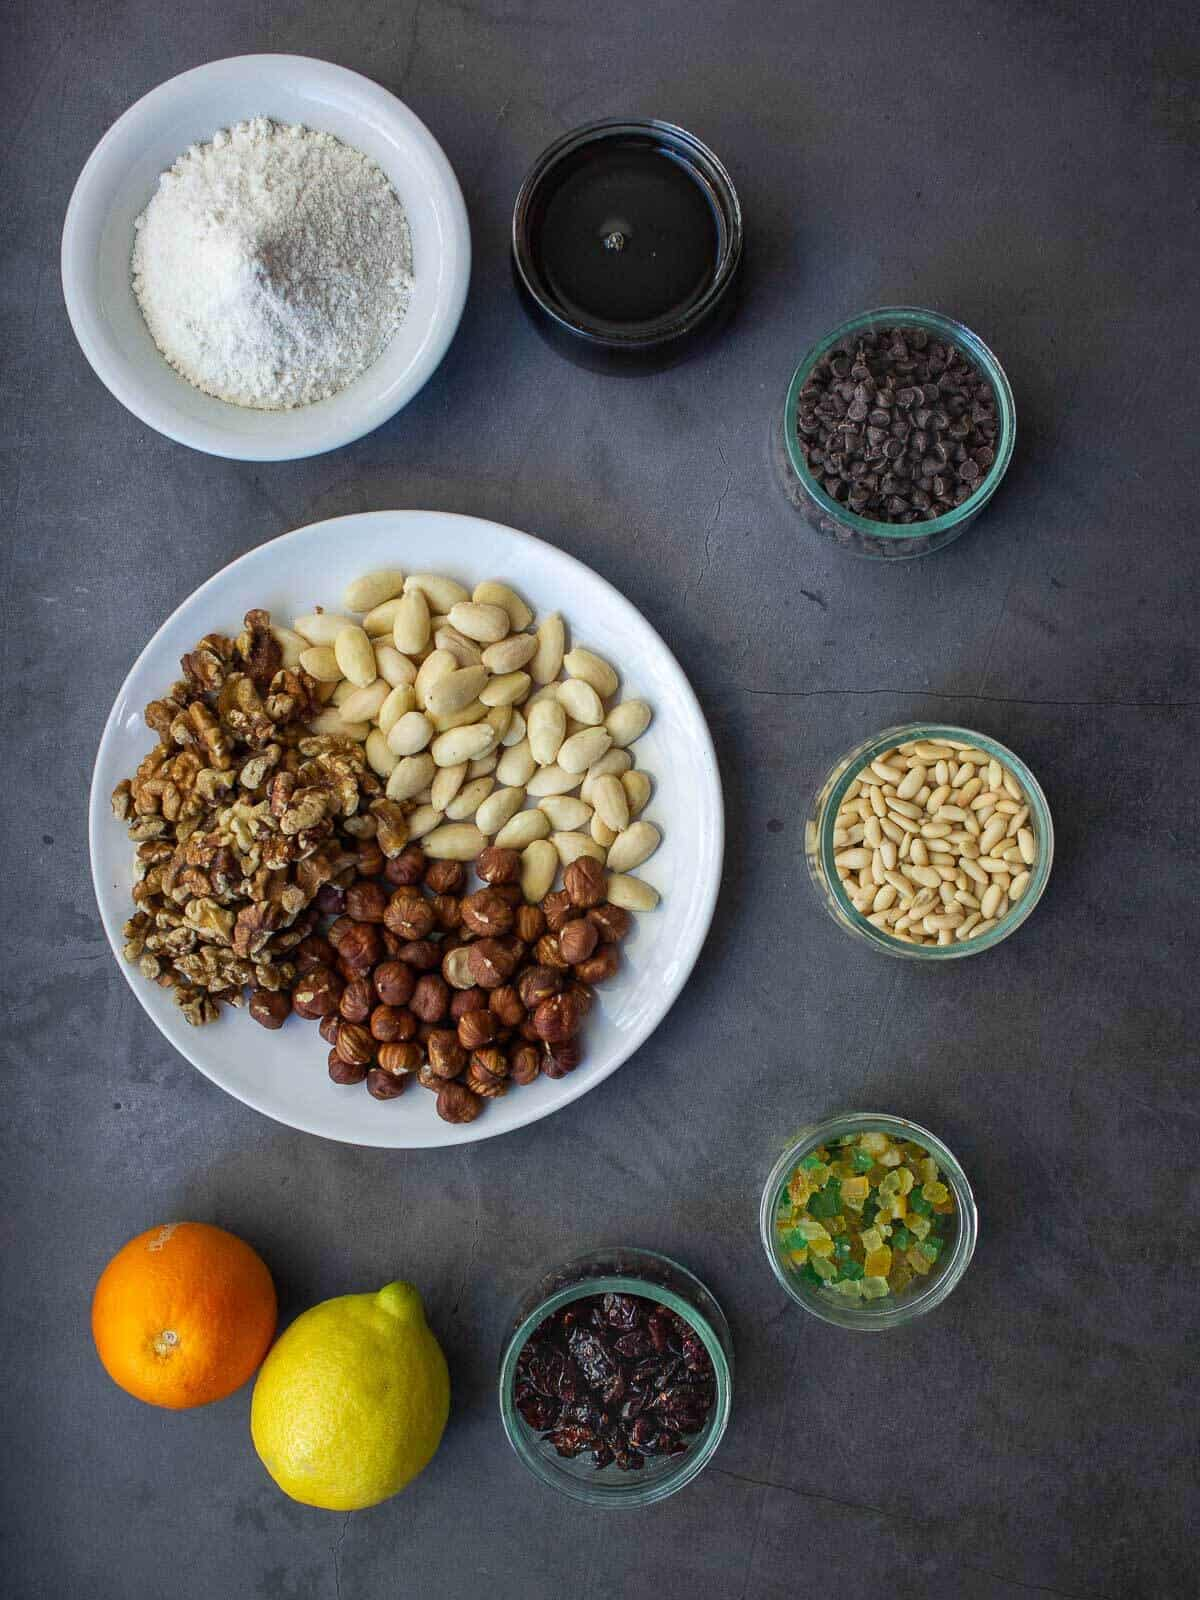 pangiallo romano ingredients